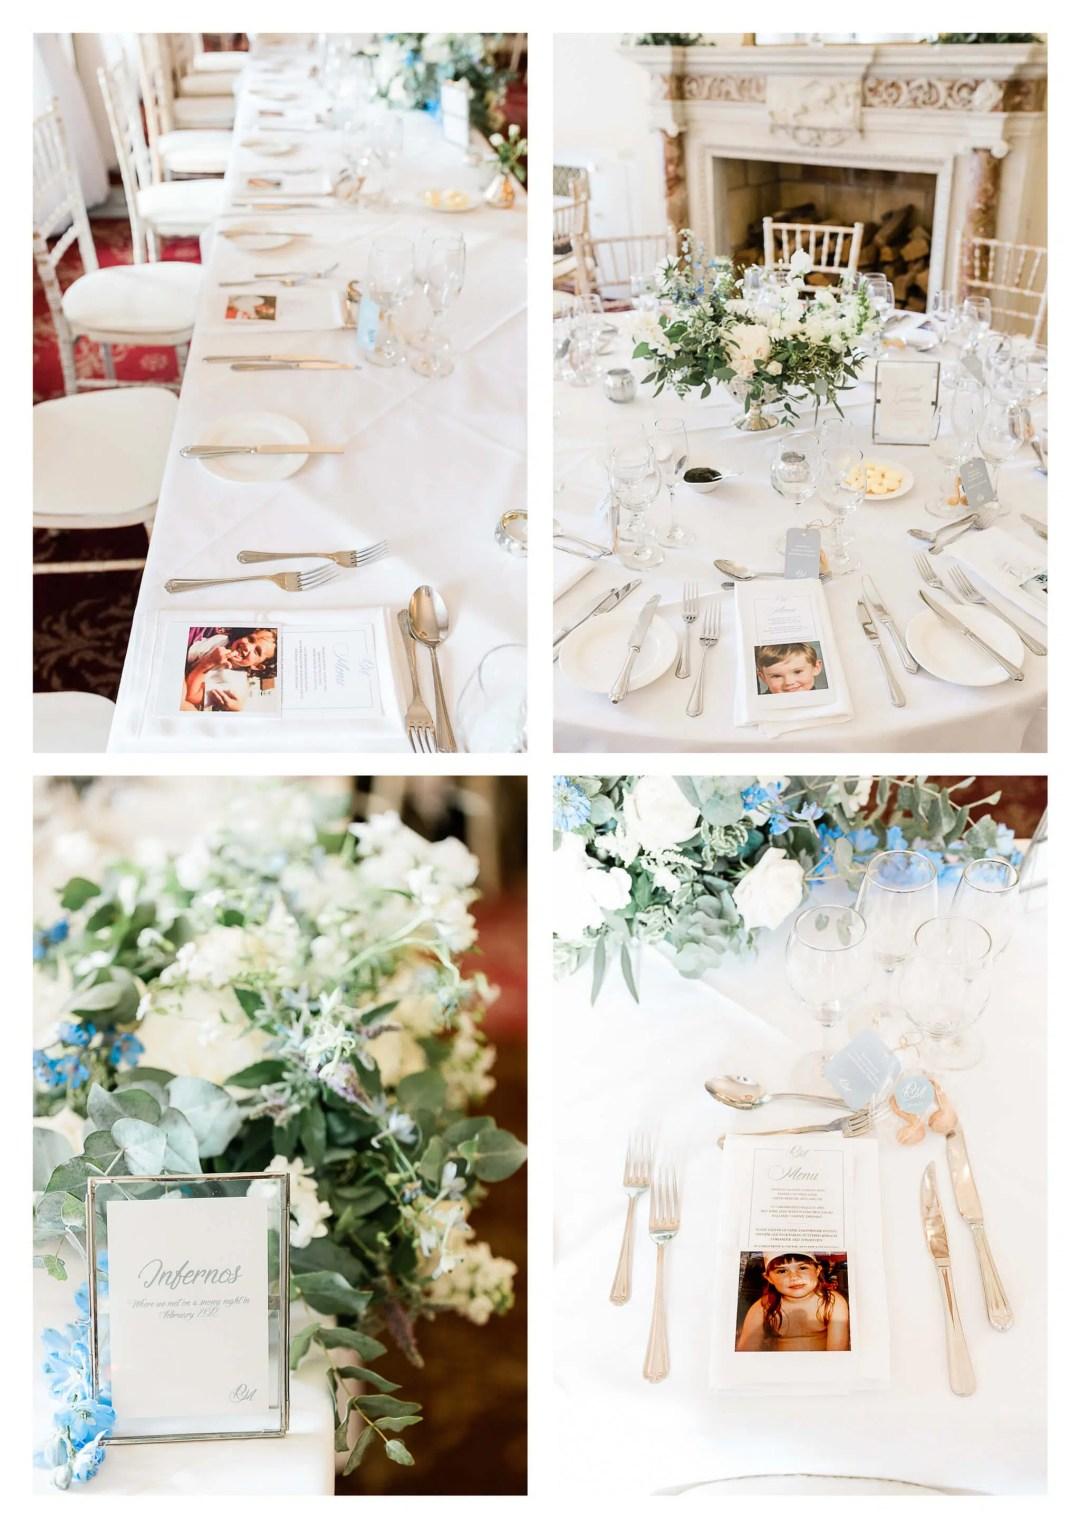 Buxted Park Hotel wedding venue reception decor | Uckfield Photography-